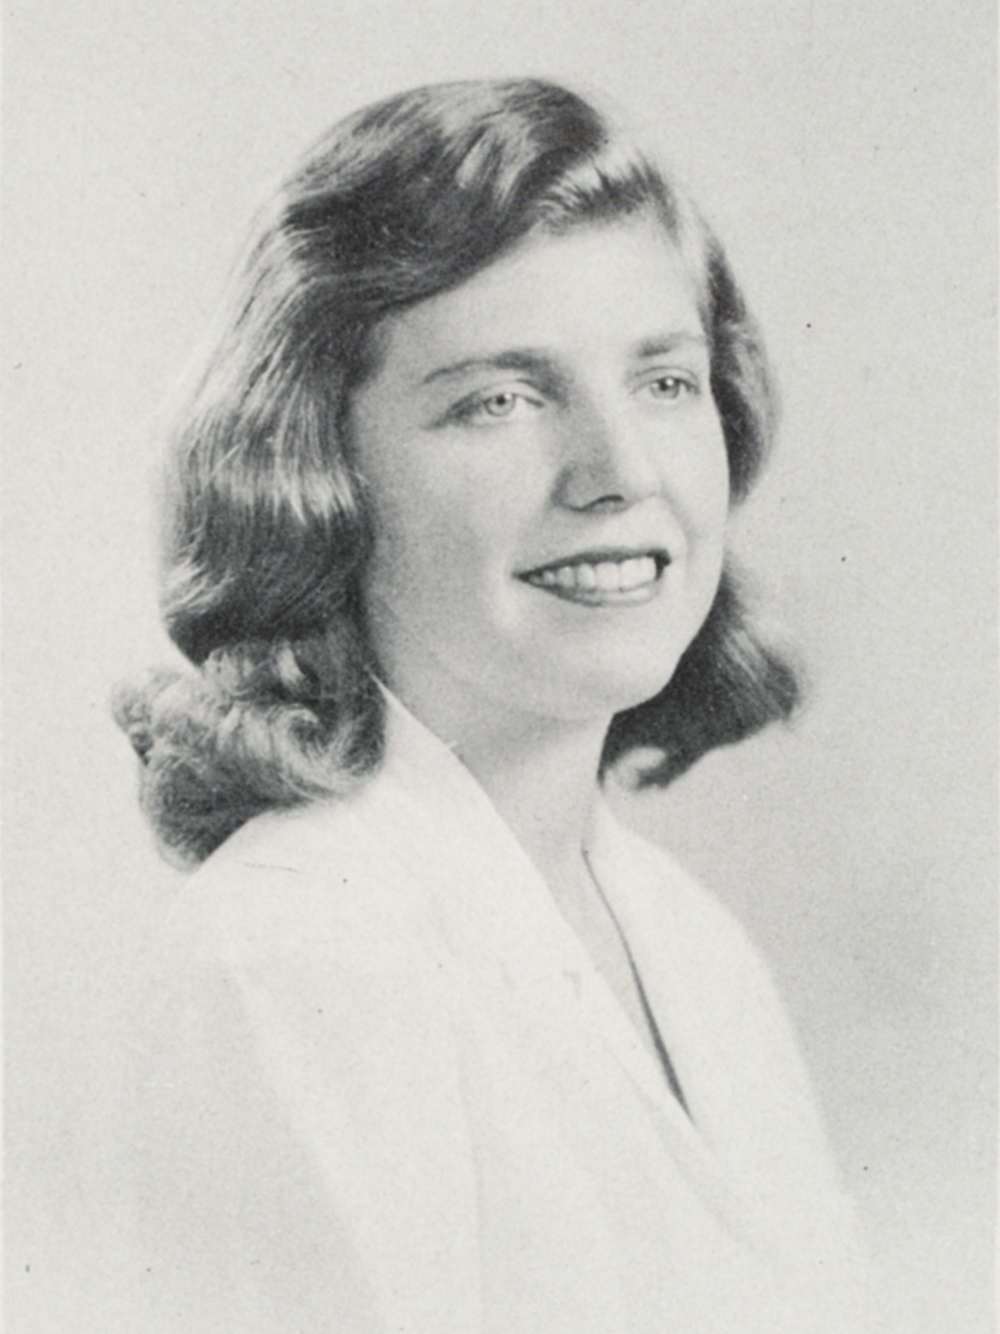 Mary Jane English Schmitz